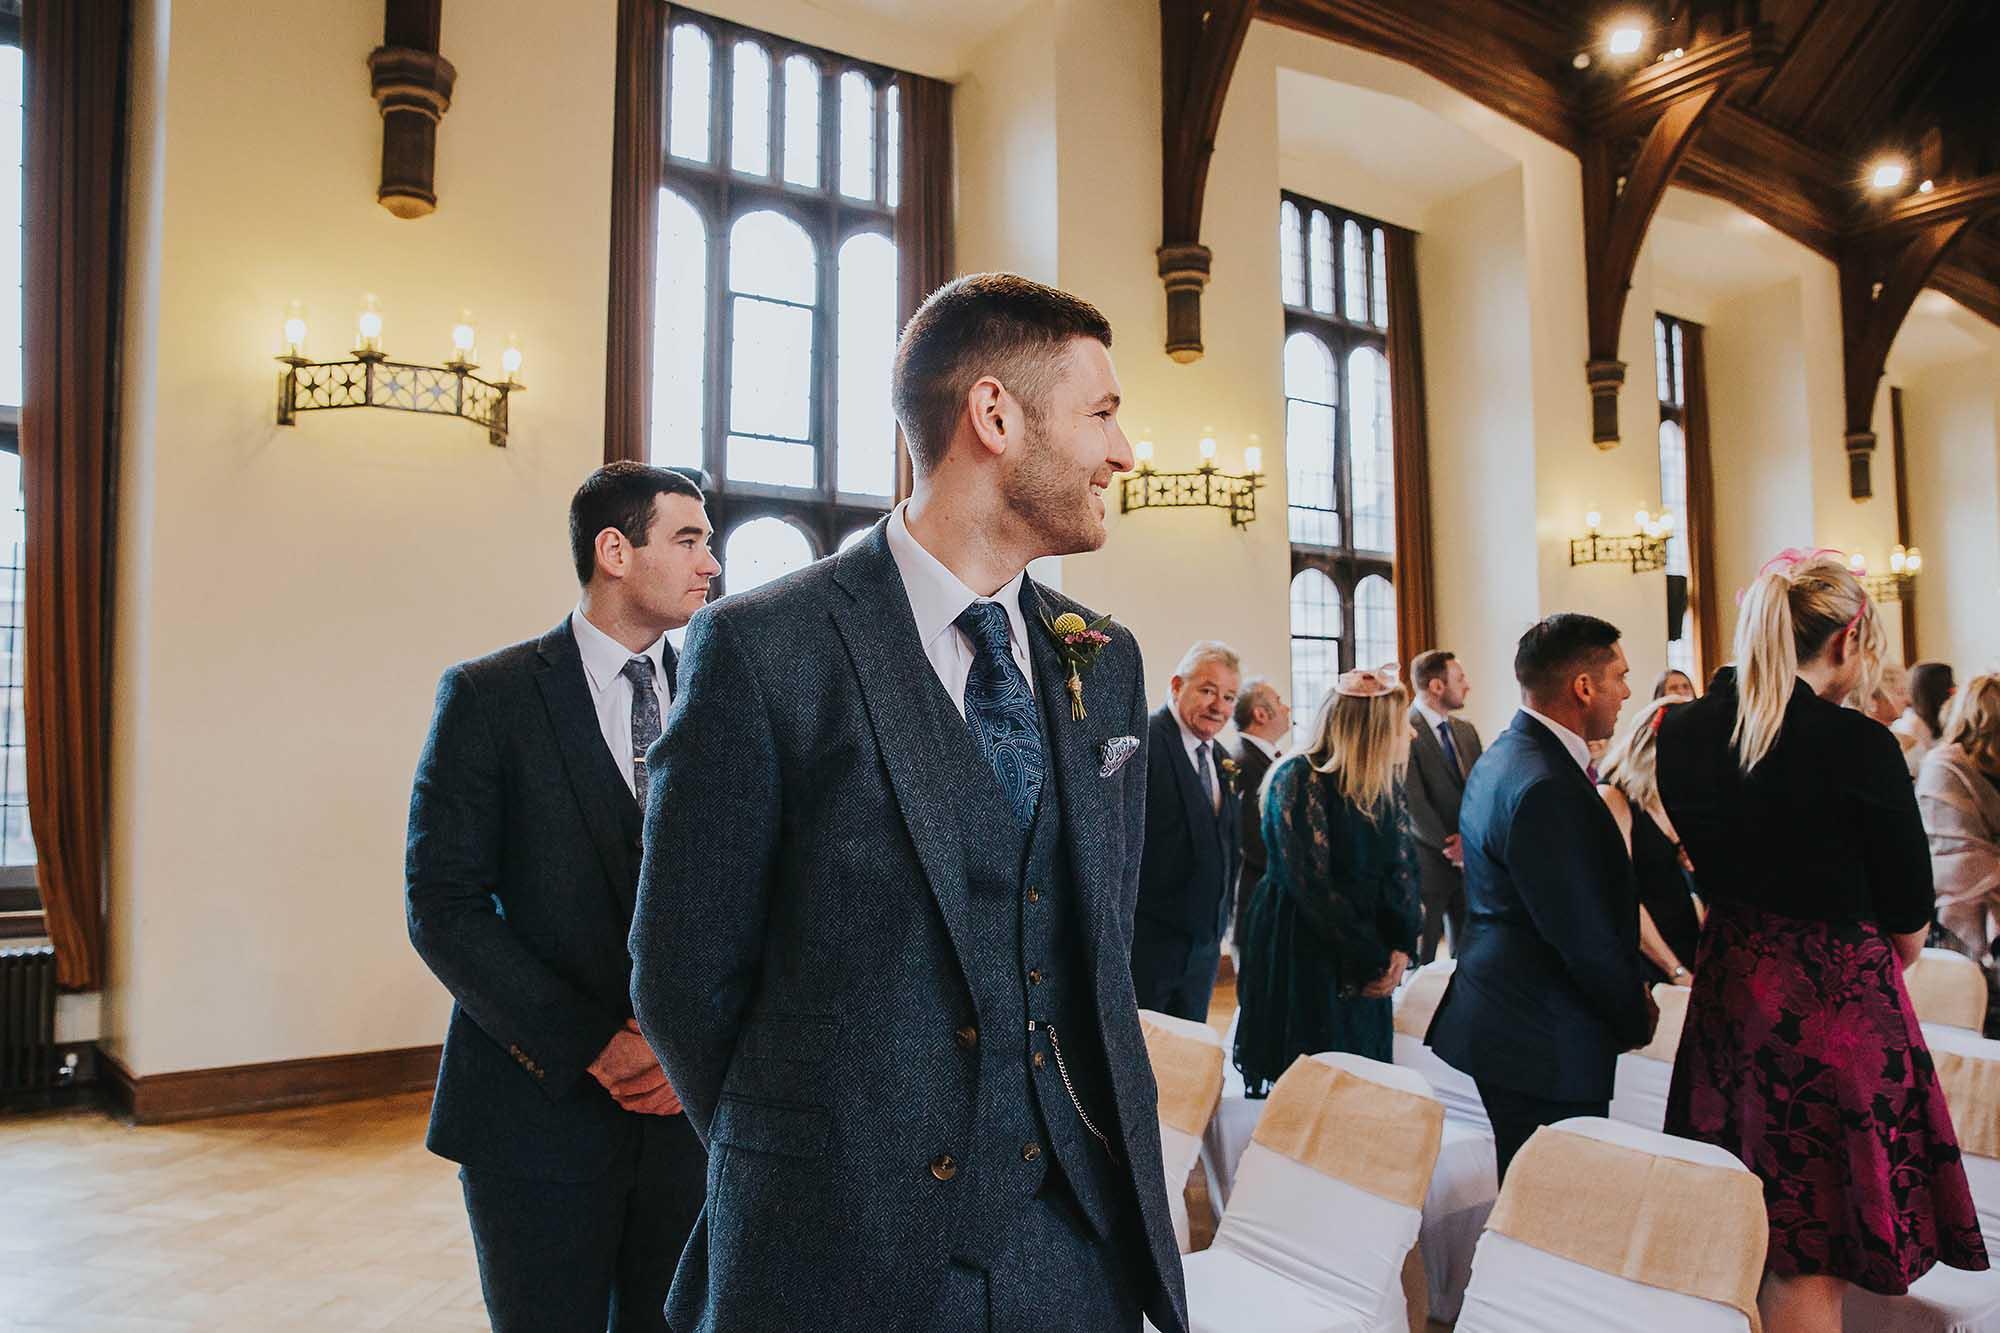 wedding ceremony in Bolton School